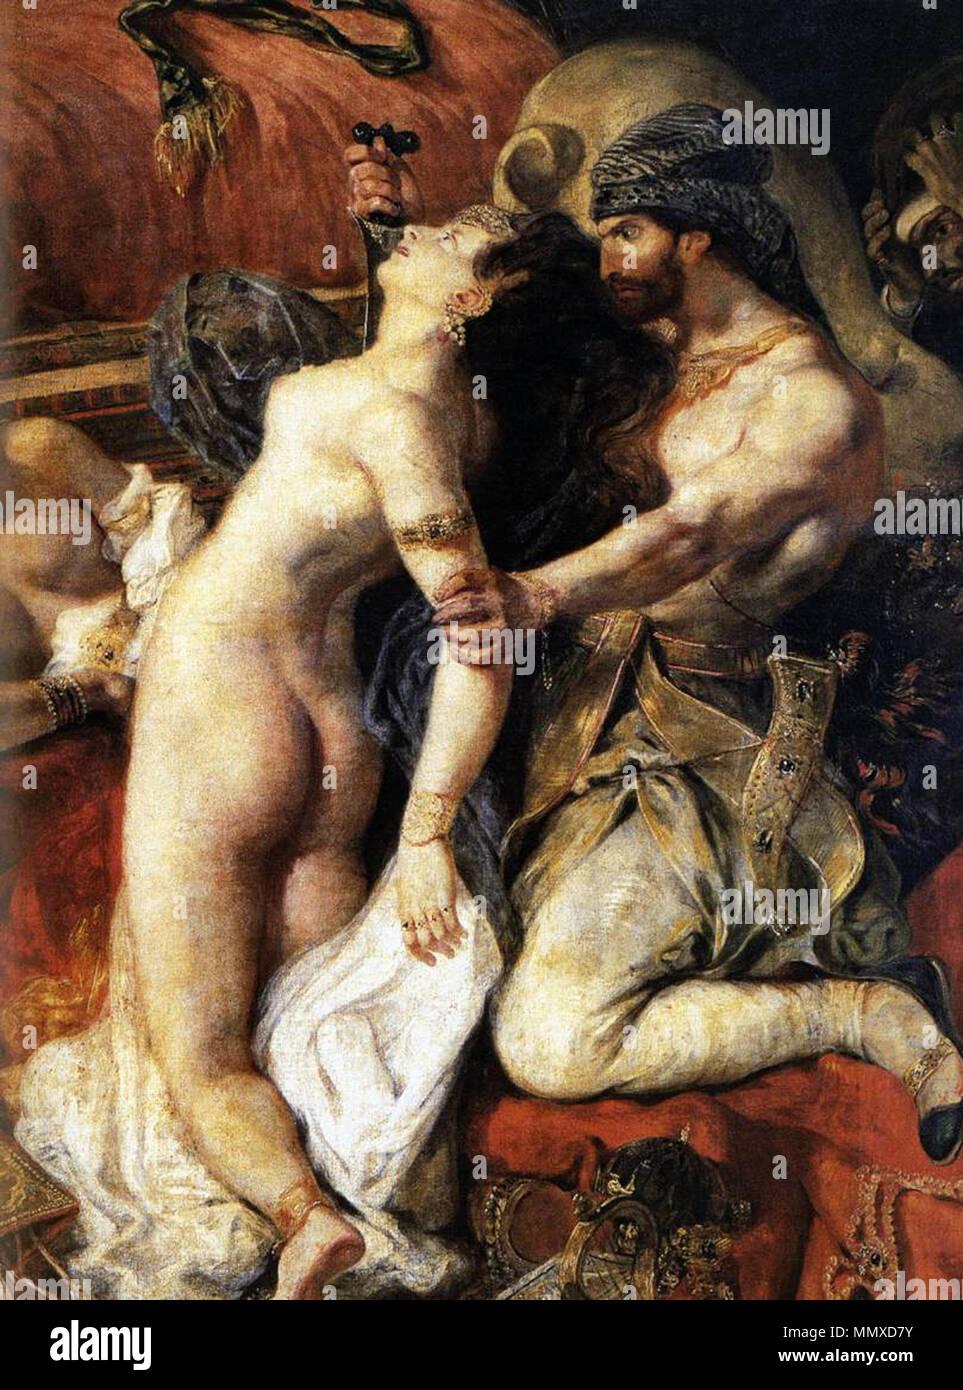 alleged historical sex offen - HD809×1092